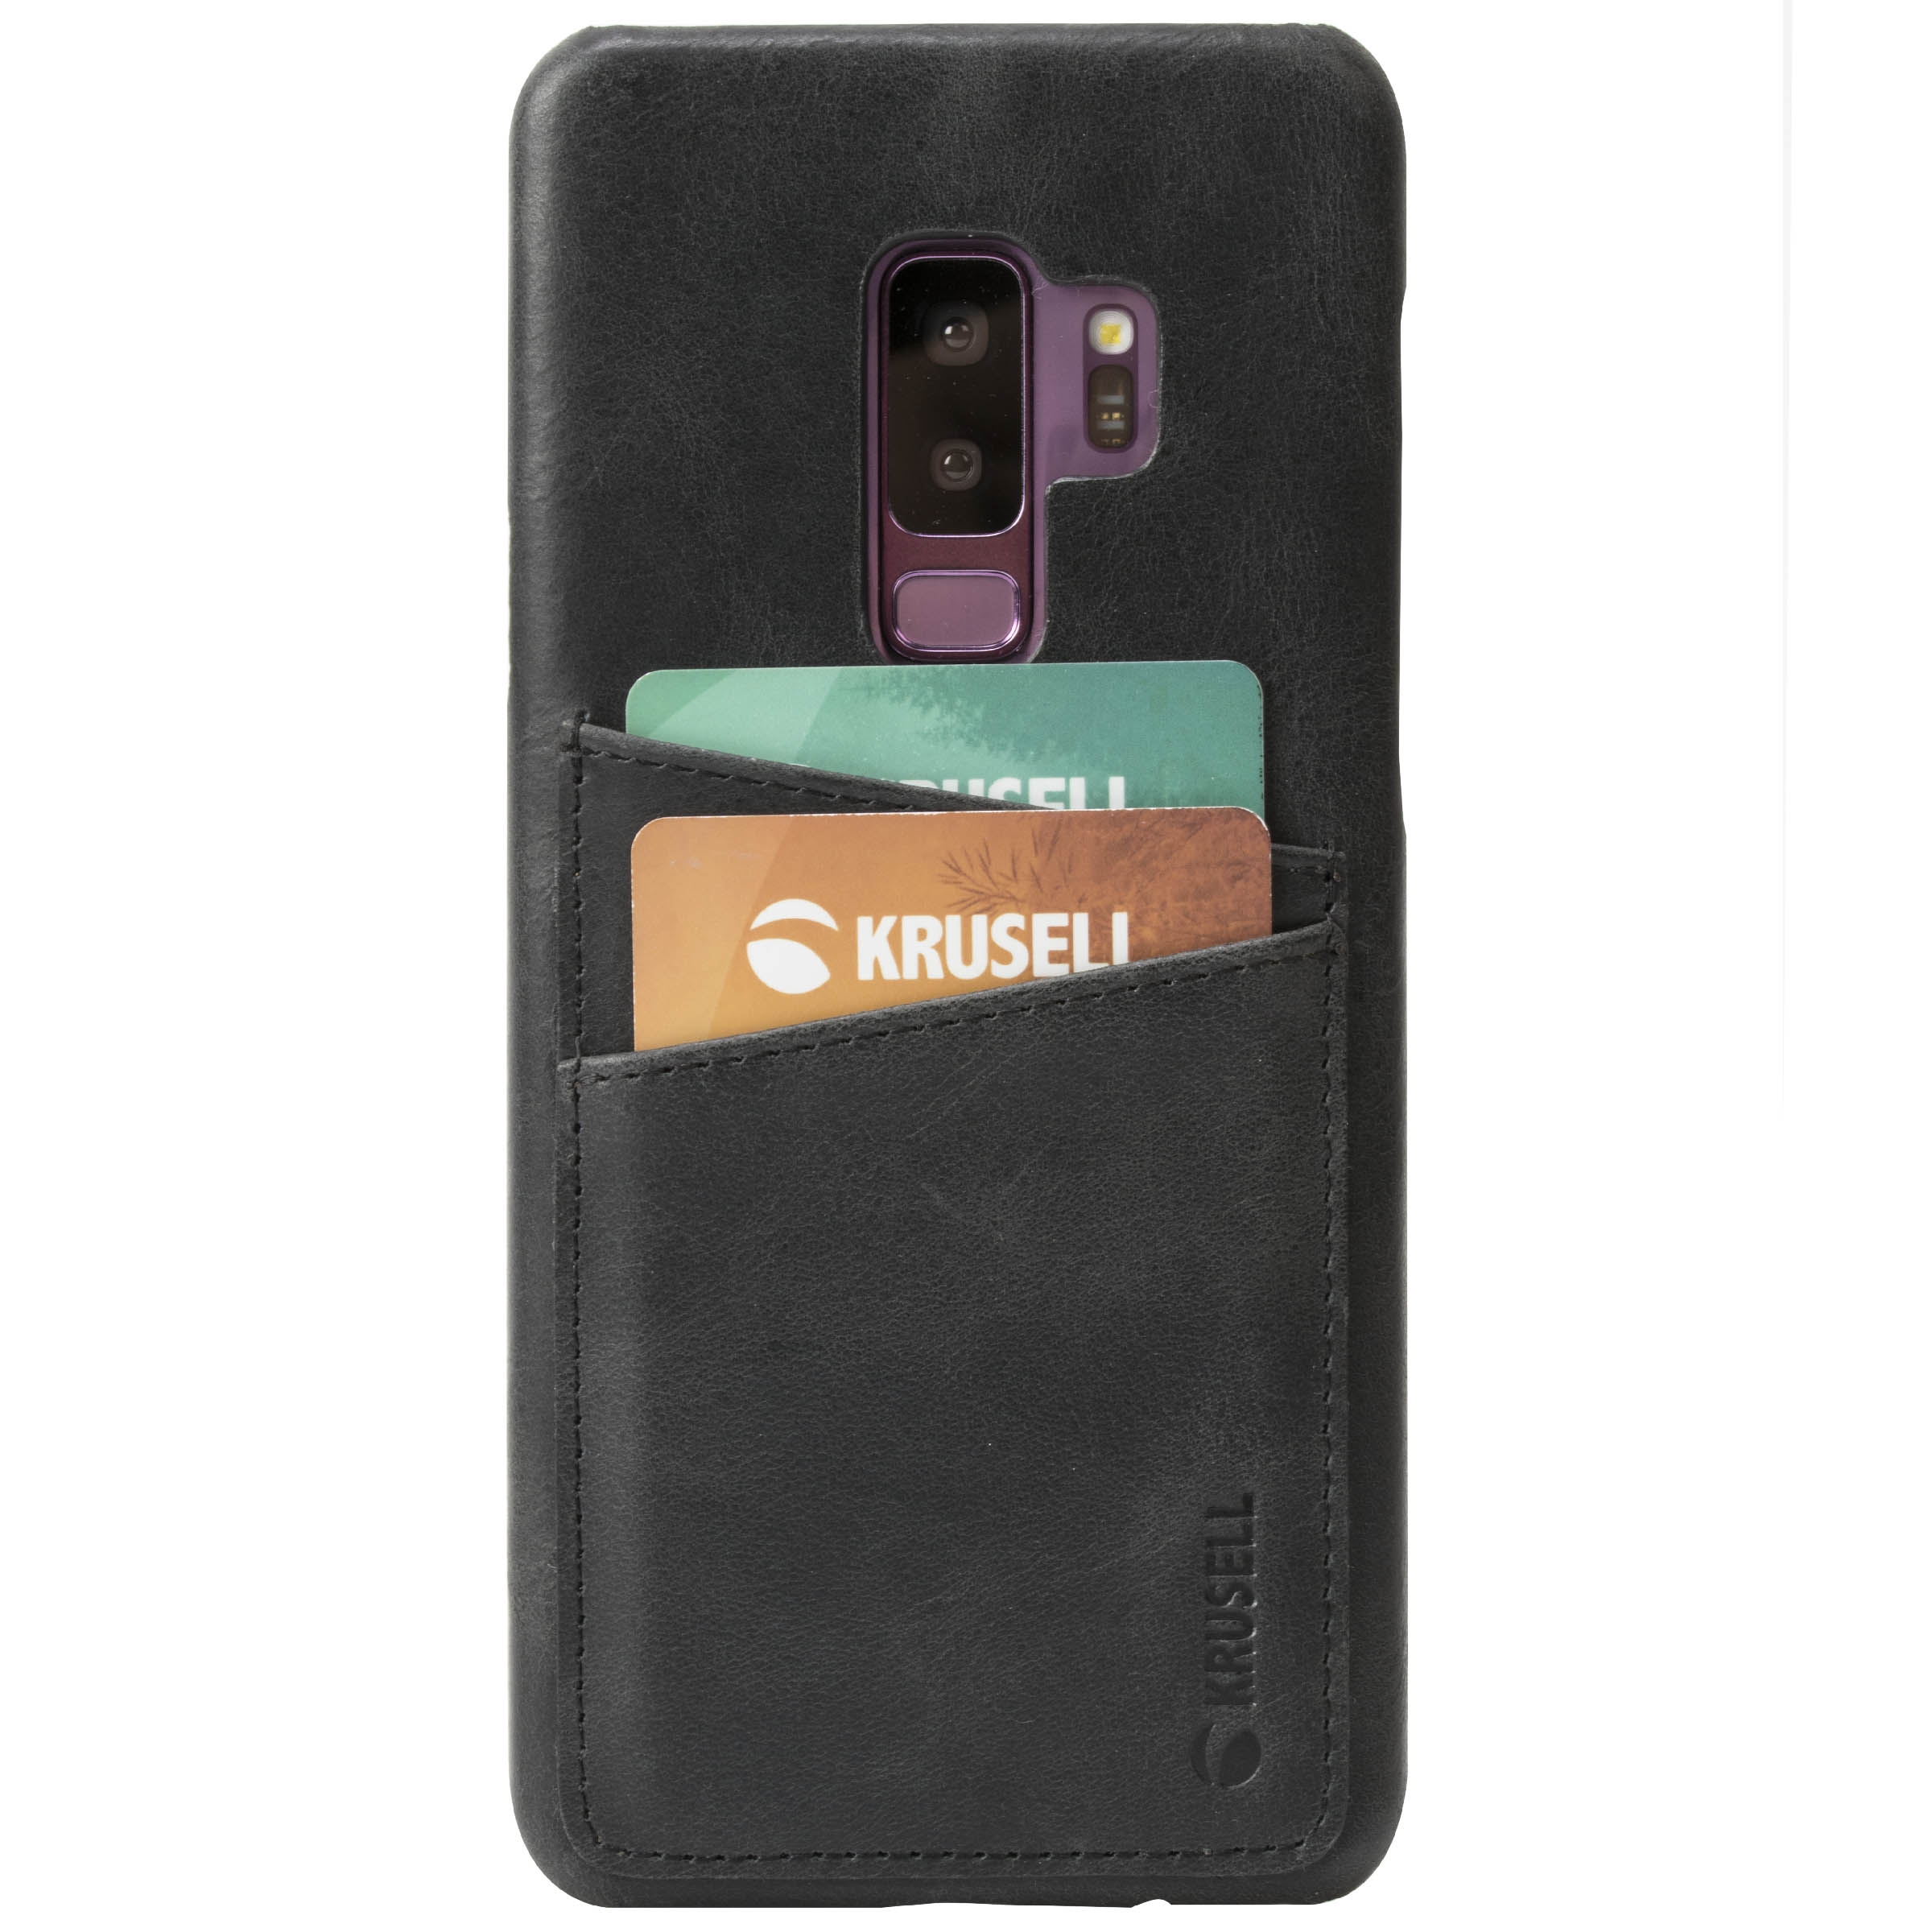 Capac protectie spate Krusell Sunne Cover 2 Card pentru Samsung Galaxy S9 Plus (G965F) Leather Vintage Black